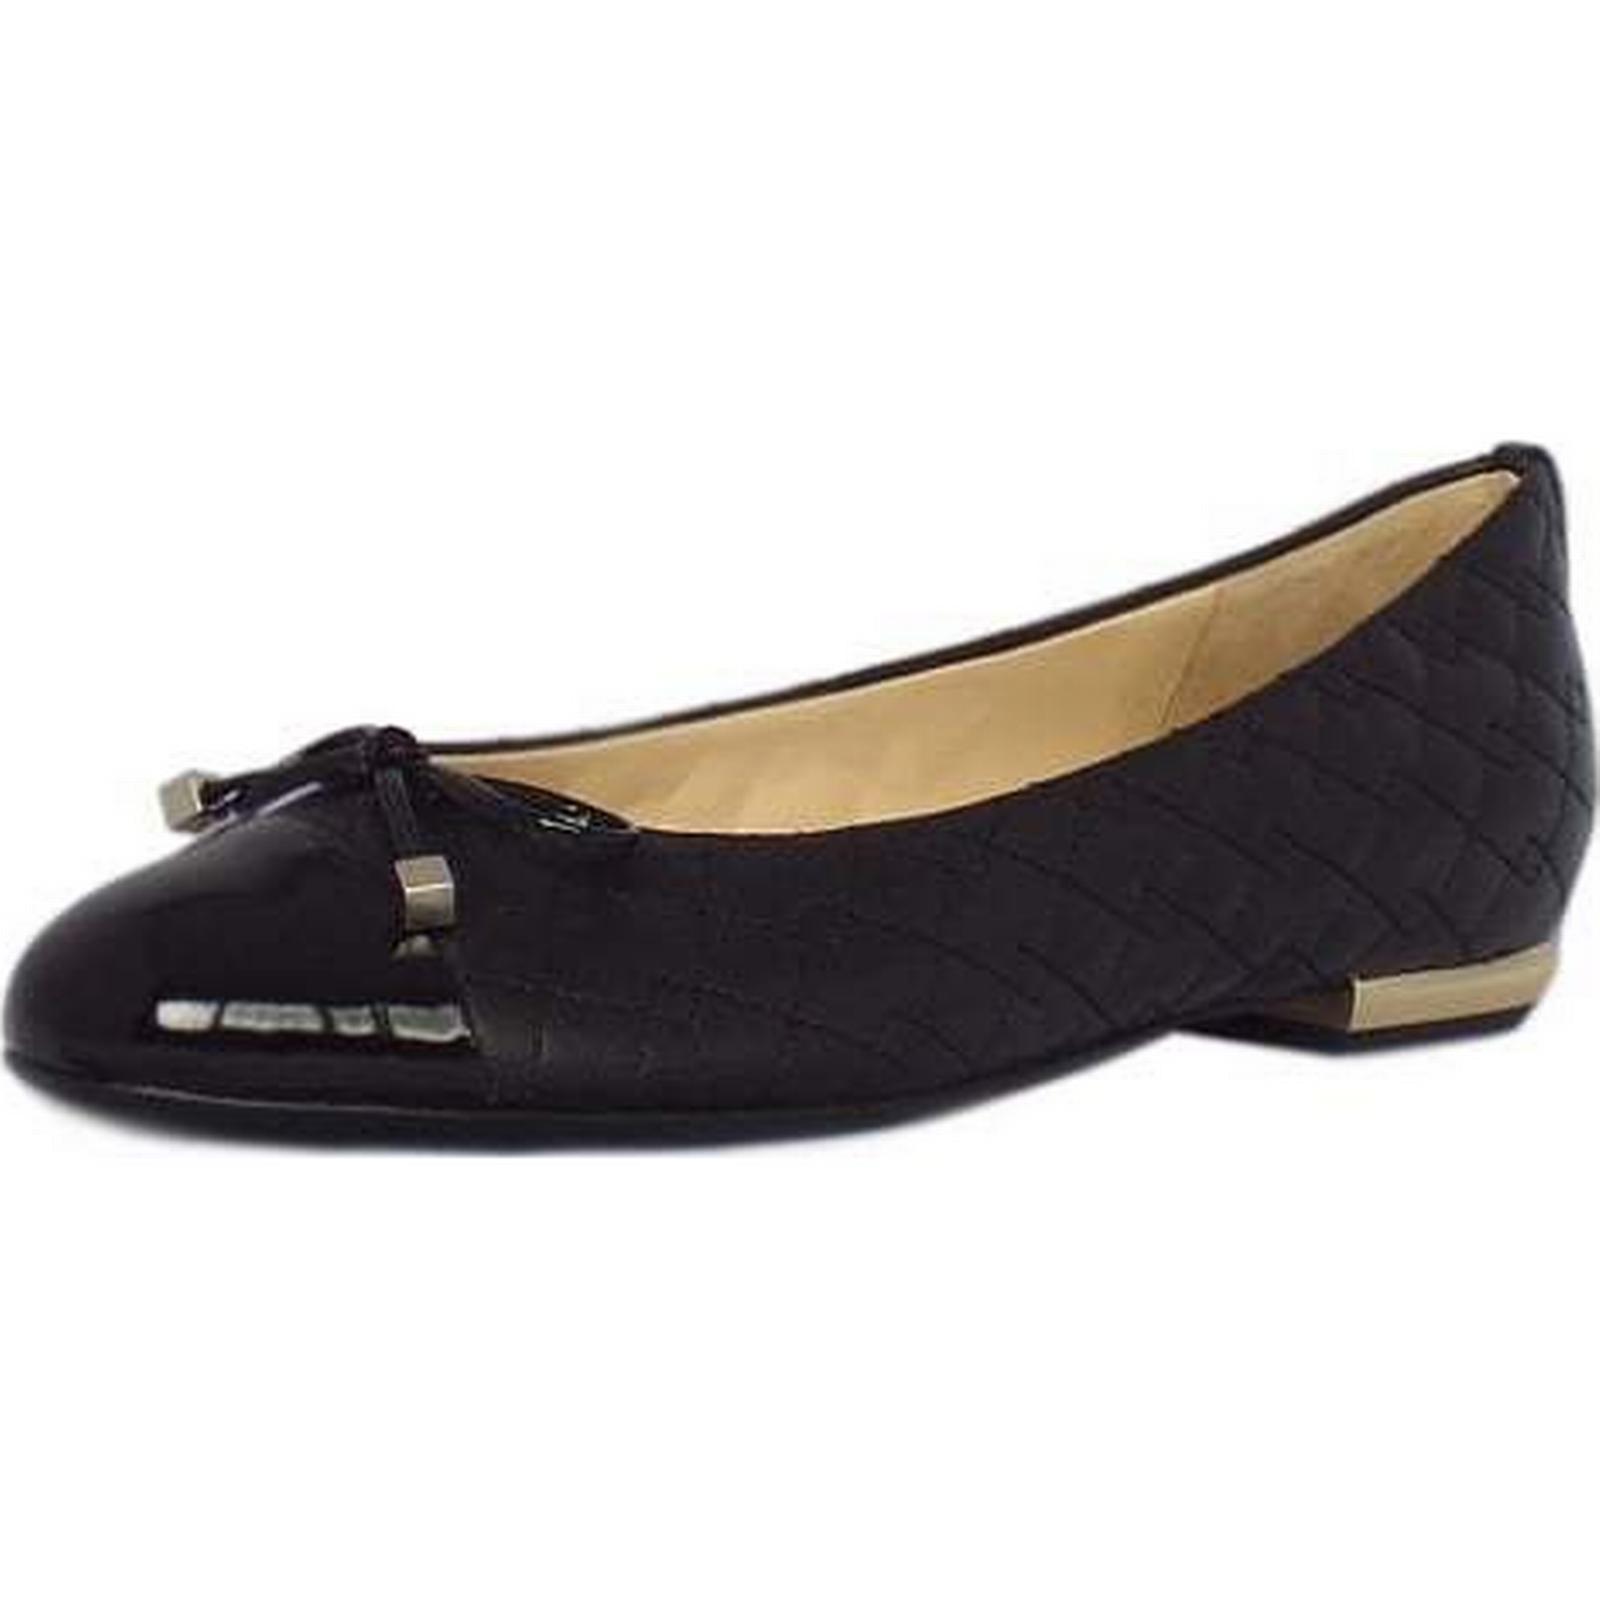 Högl Hogl KELSALL LADIES HOGL LADIES KELSALL SHOES Size: 6, Colour: BLACK 803f74